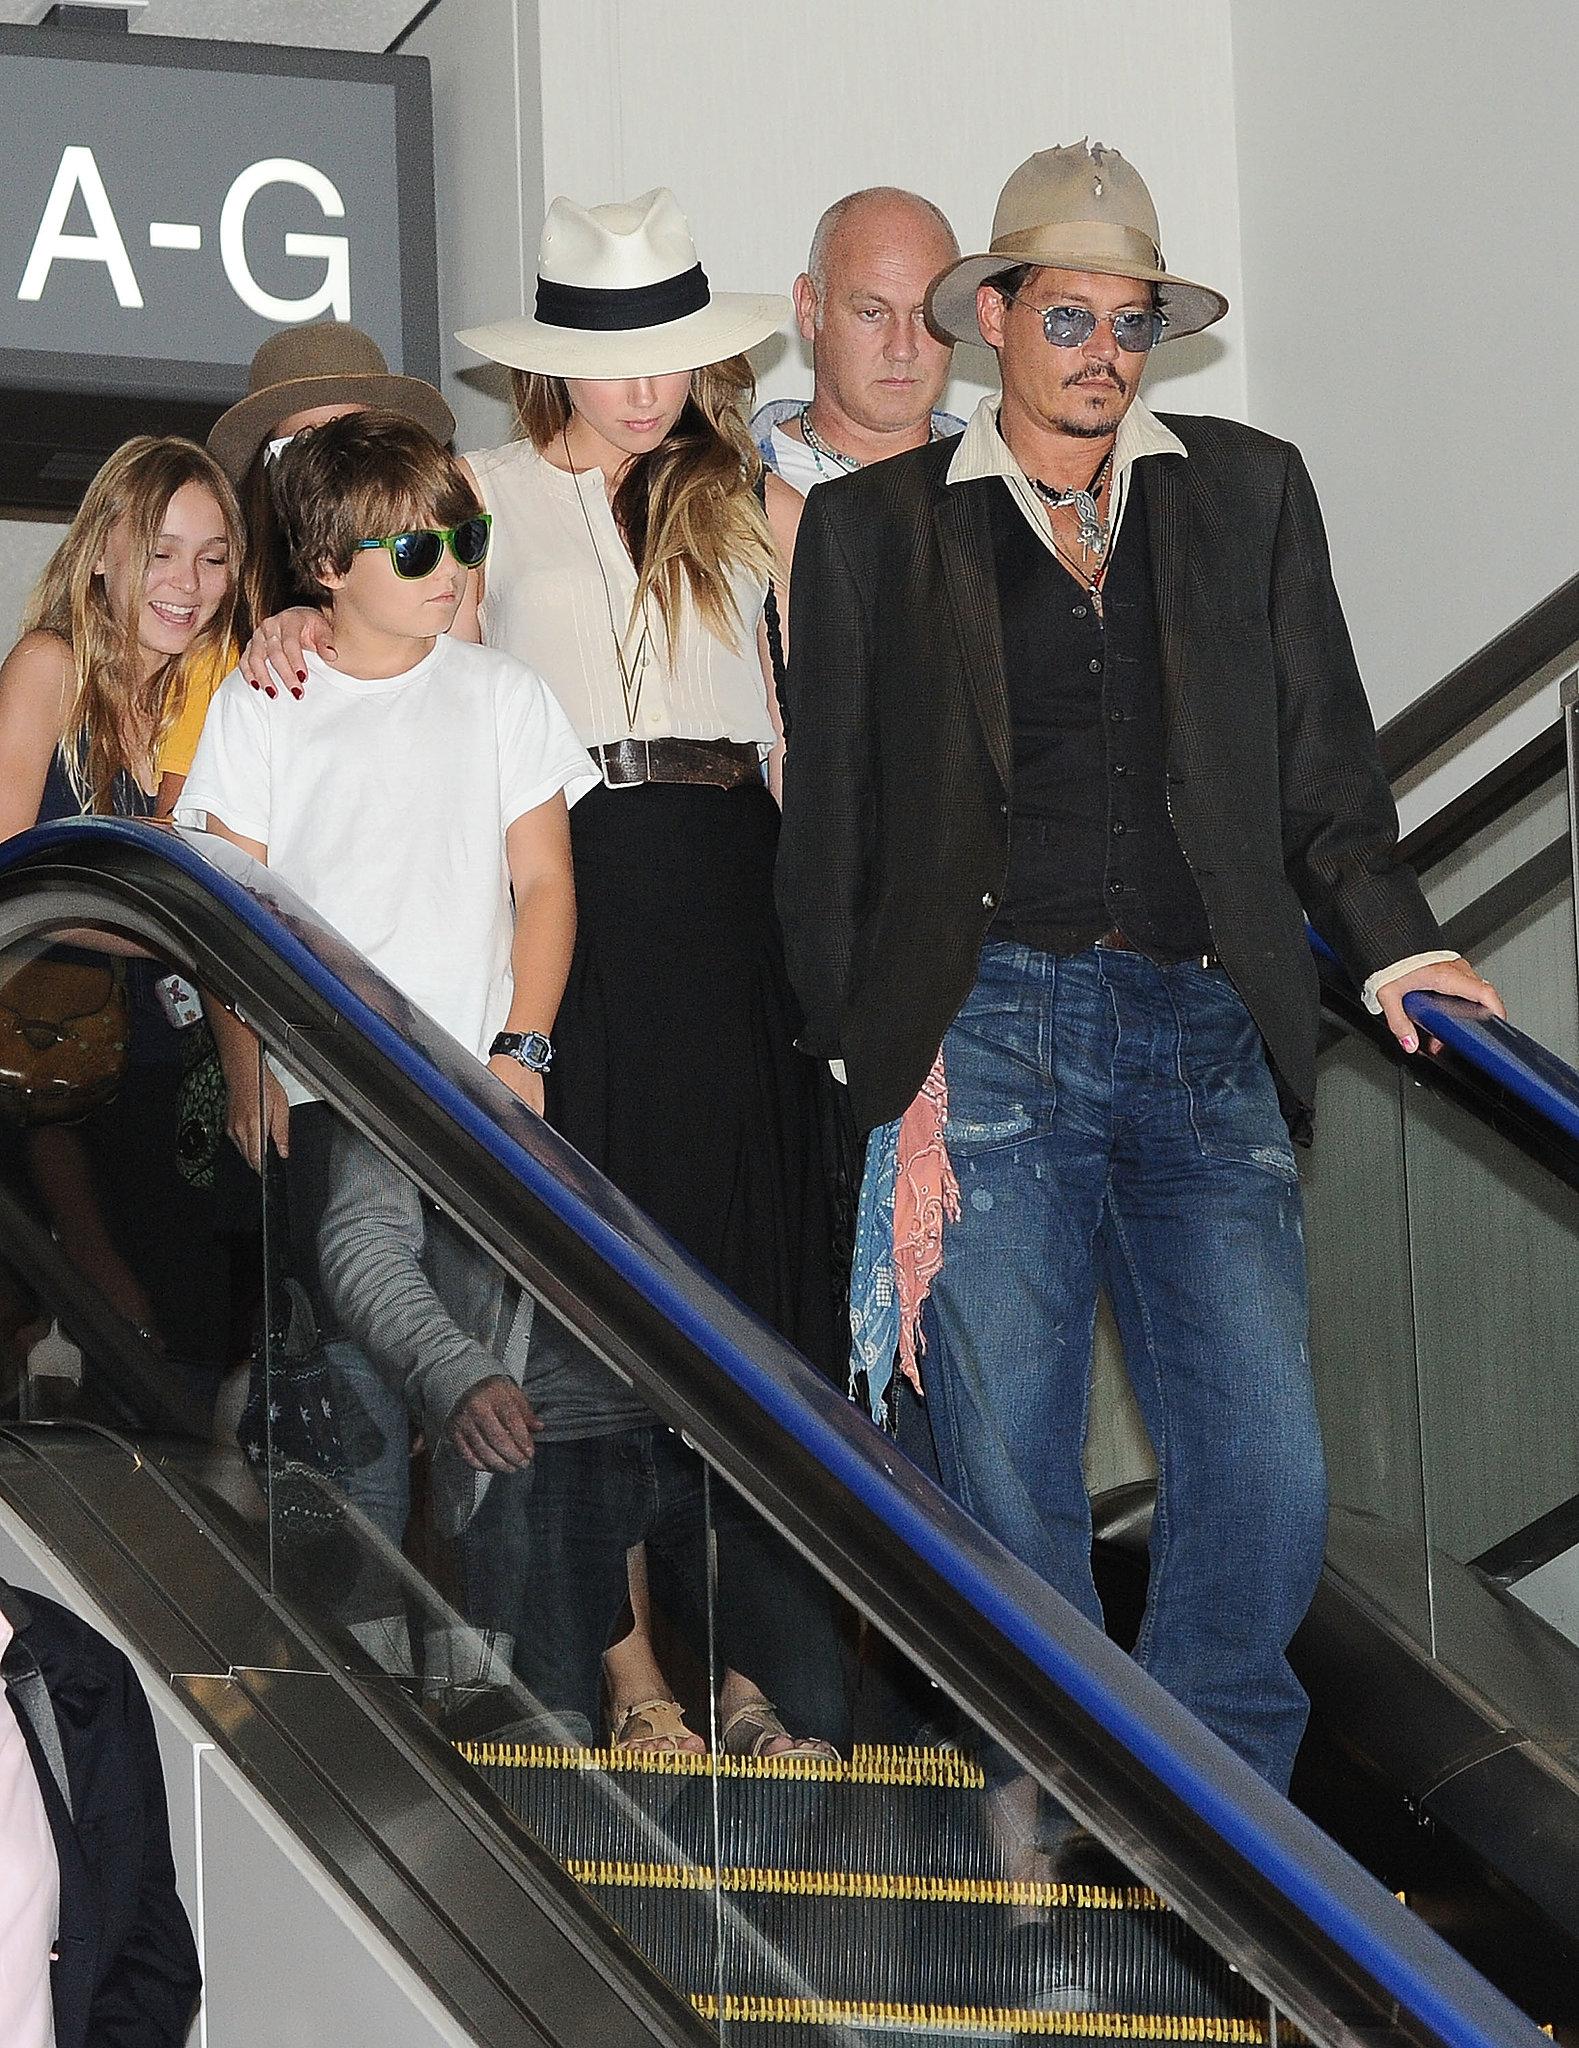 Amber Heard had her arm around Johnny Depp's son, Jack.